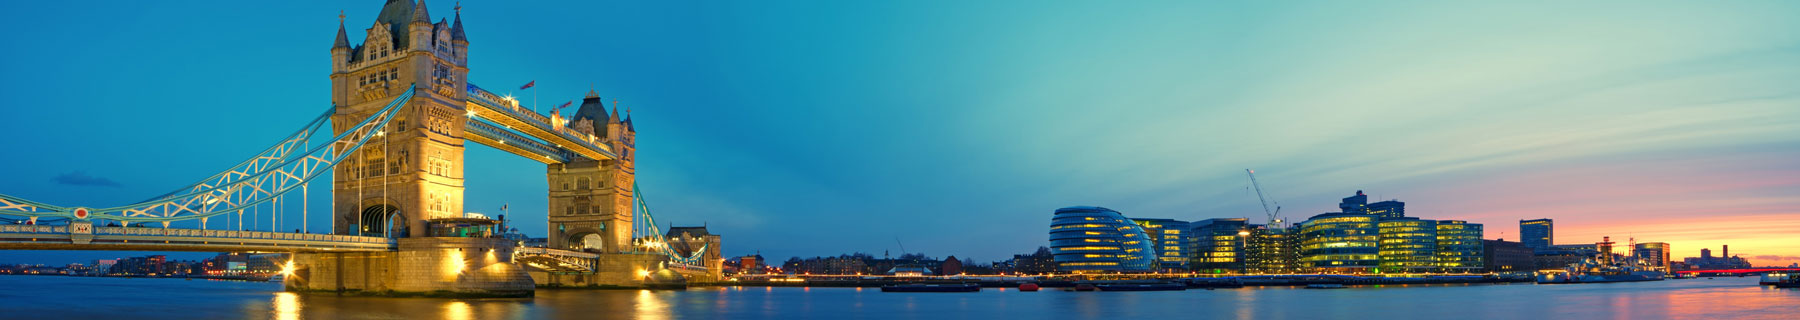 Haken-Plätze in London